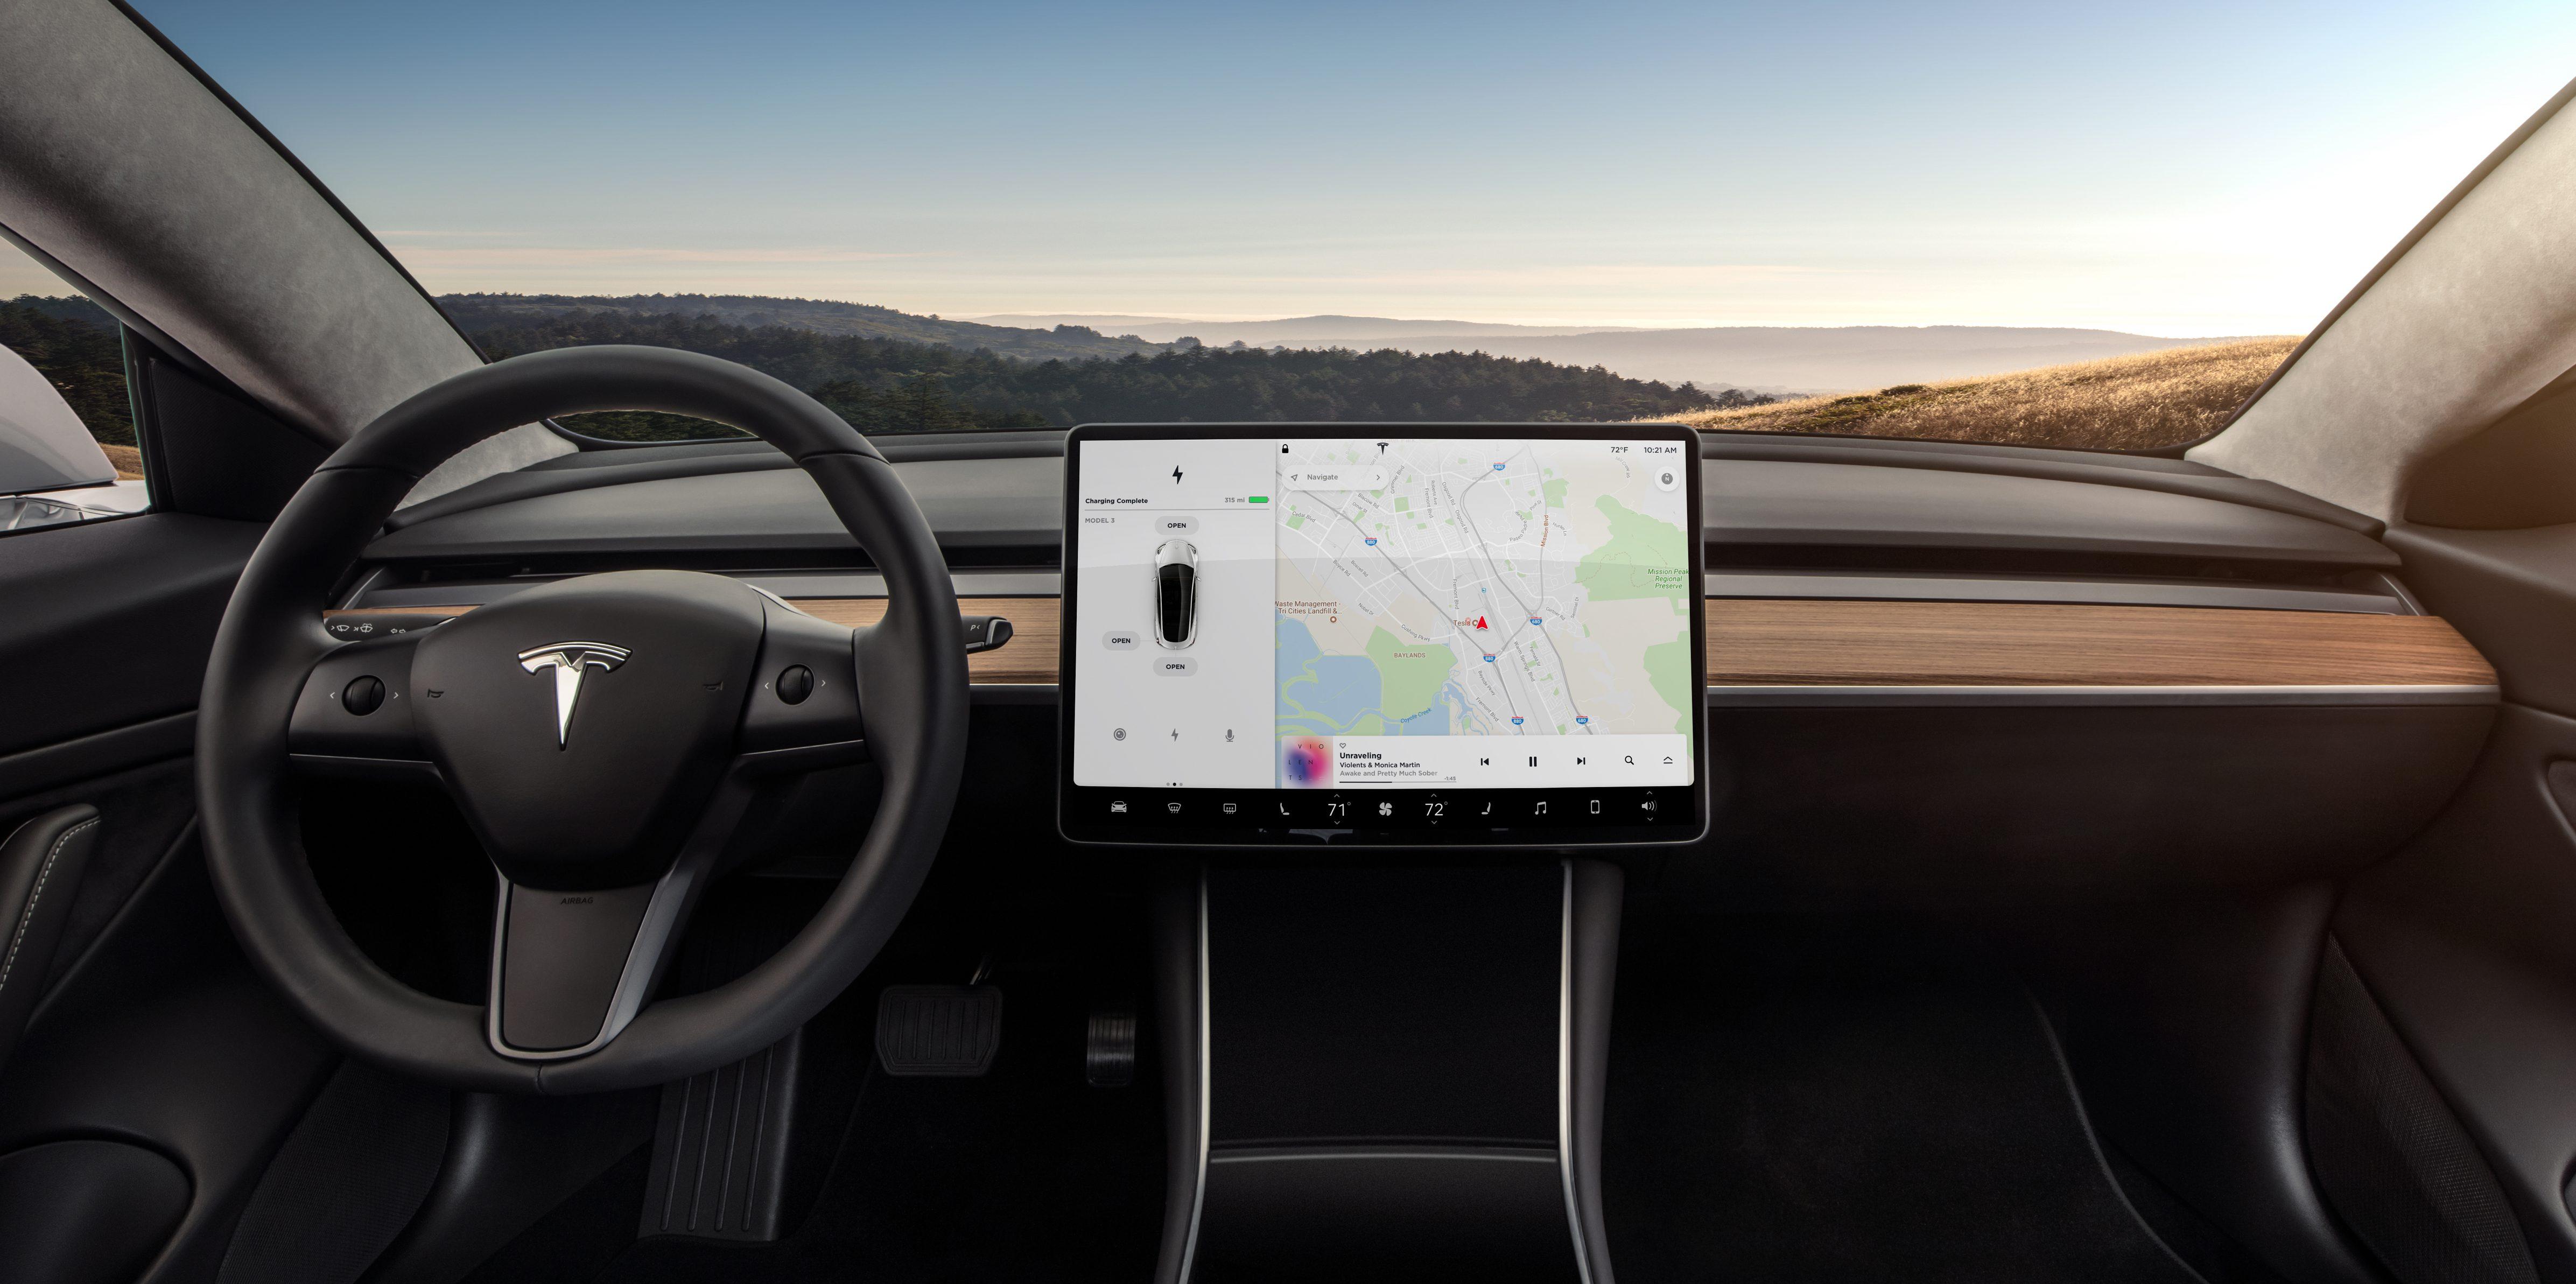 Will the tesla model 3 have autopilot